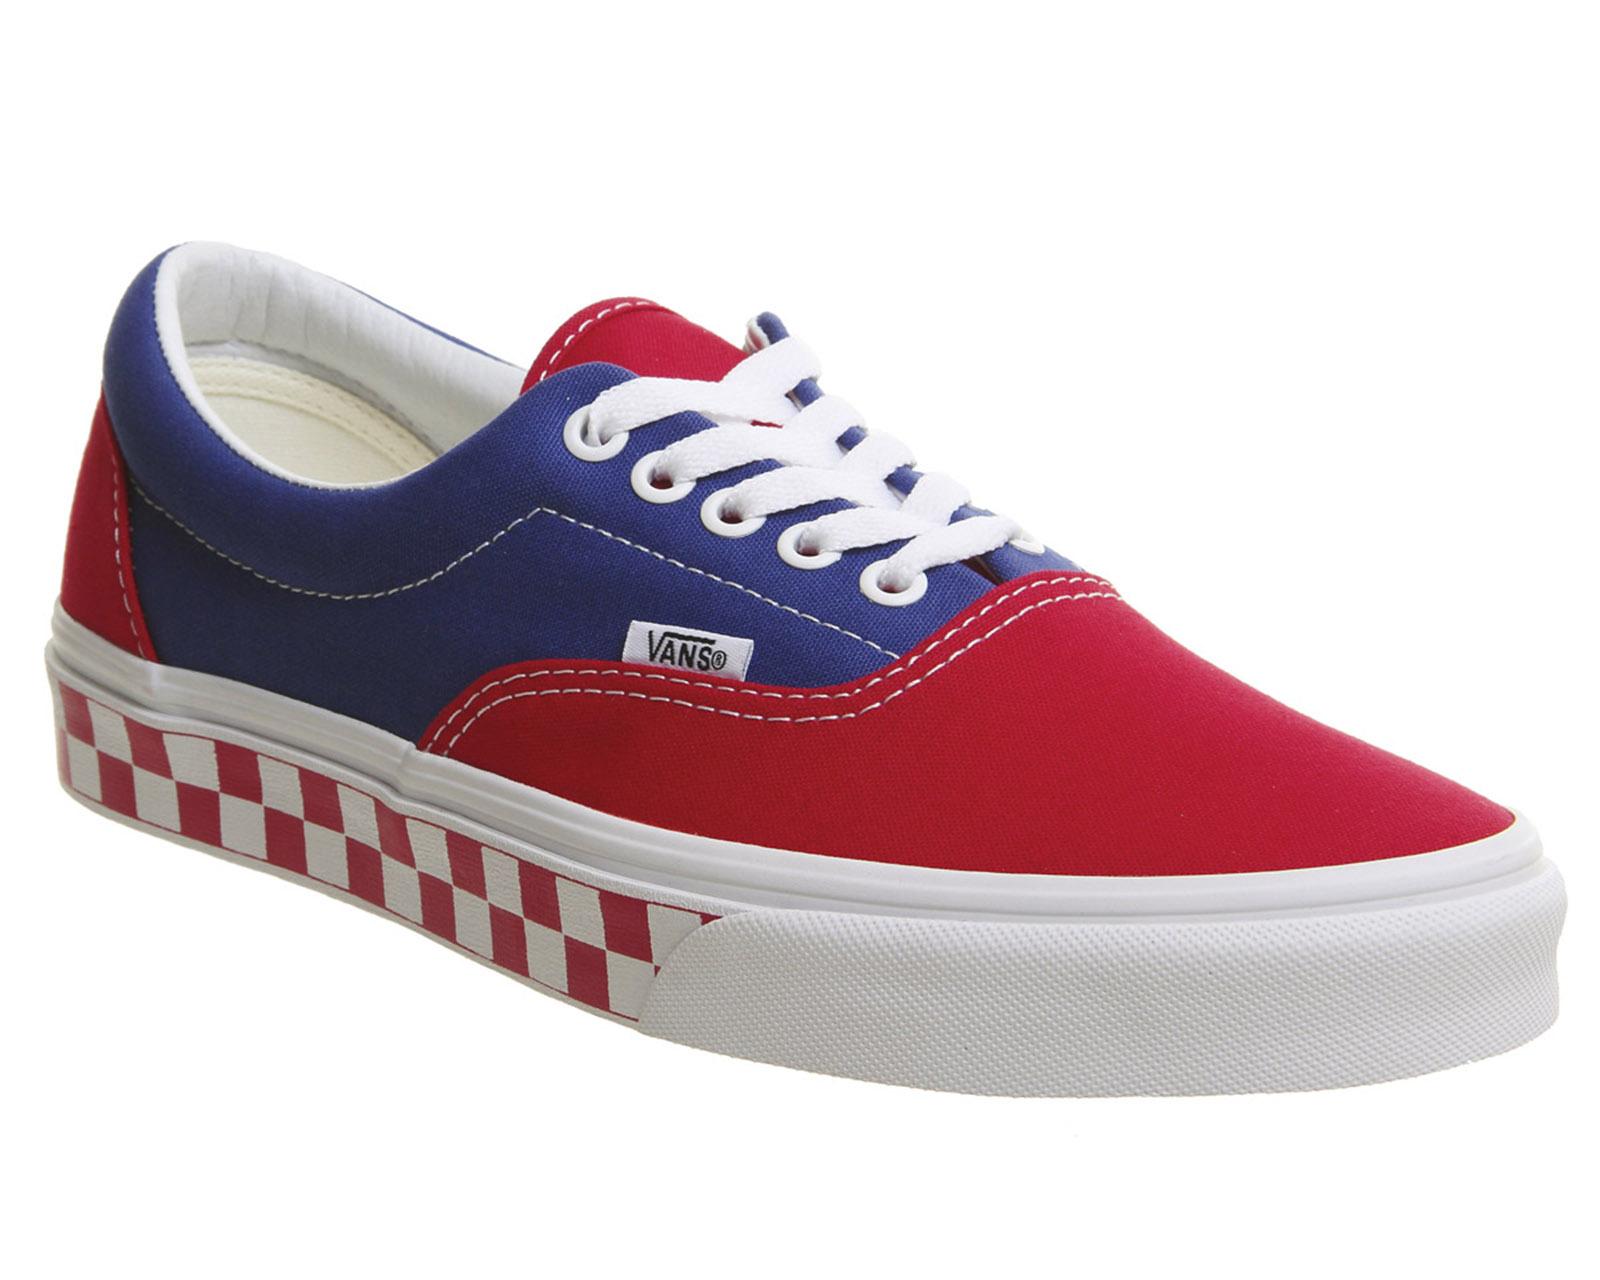 Sentinel Mens Vans Era Trainers True Blue Red Checker Trainers Shoes b35406e79